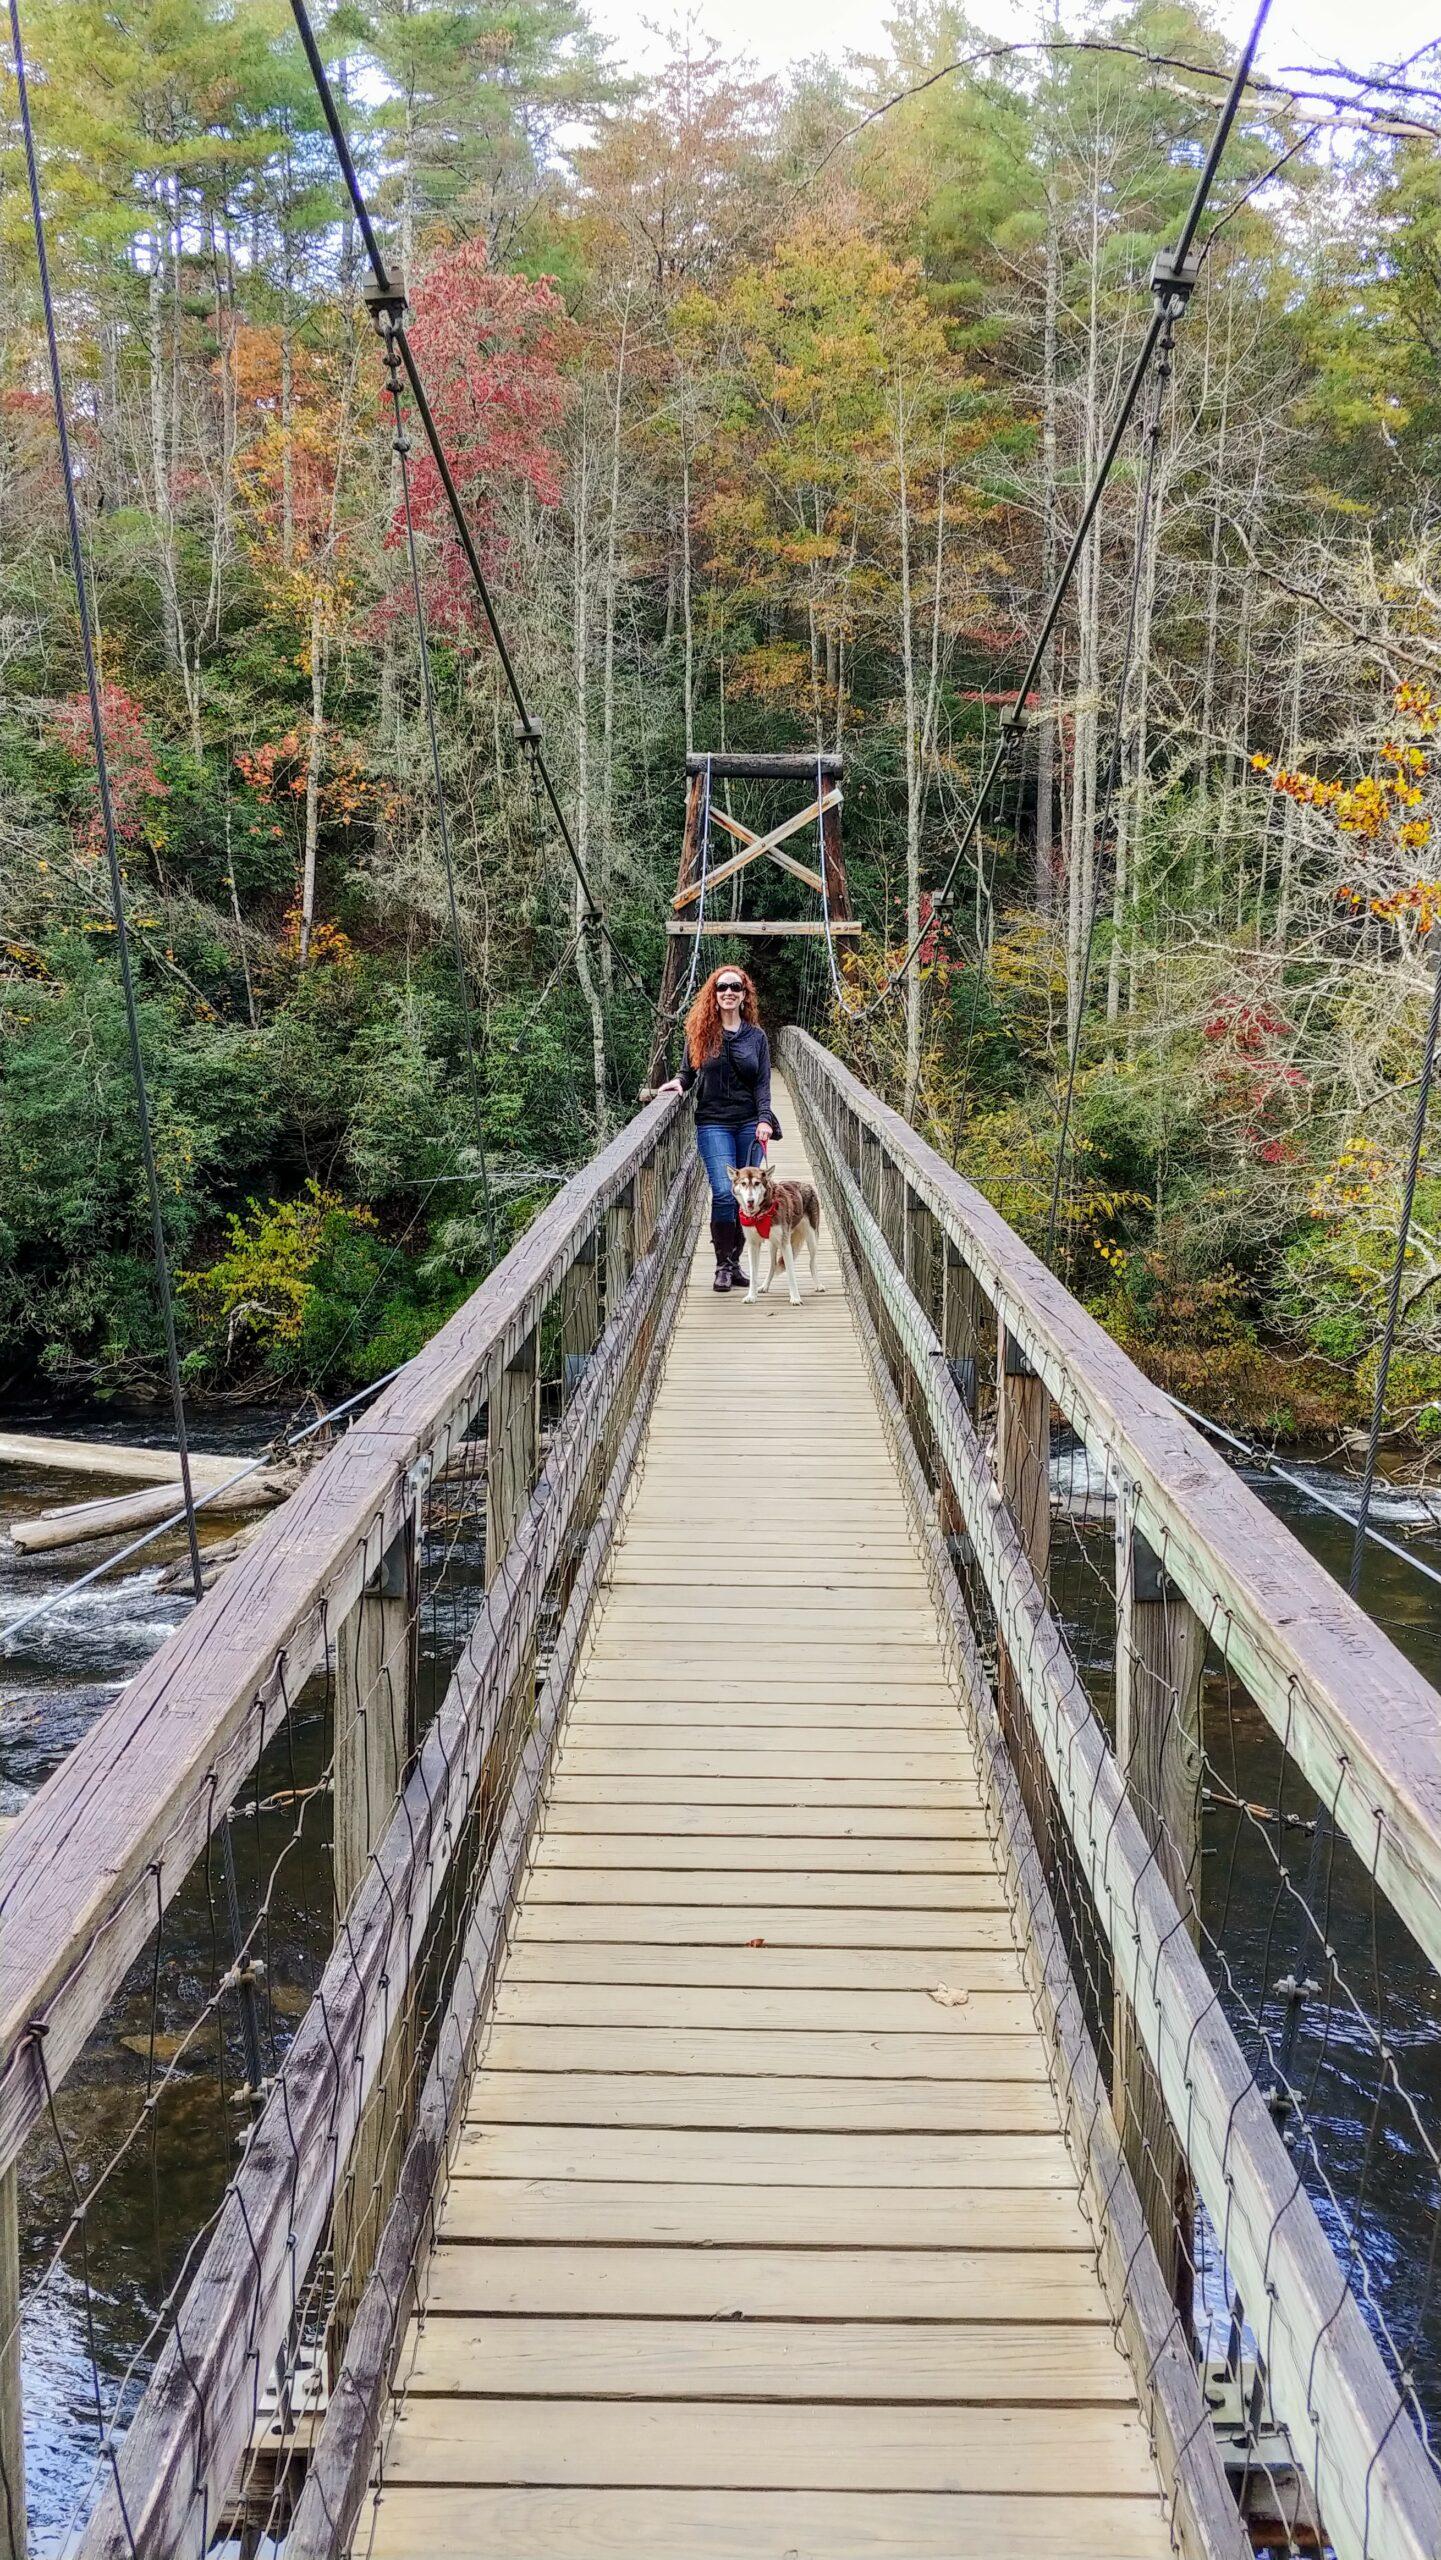 Swinging-Bridge-Toccoa-River-Benton-MacKaye-Trail-Alyce-Nina-2020-10